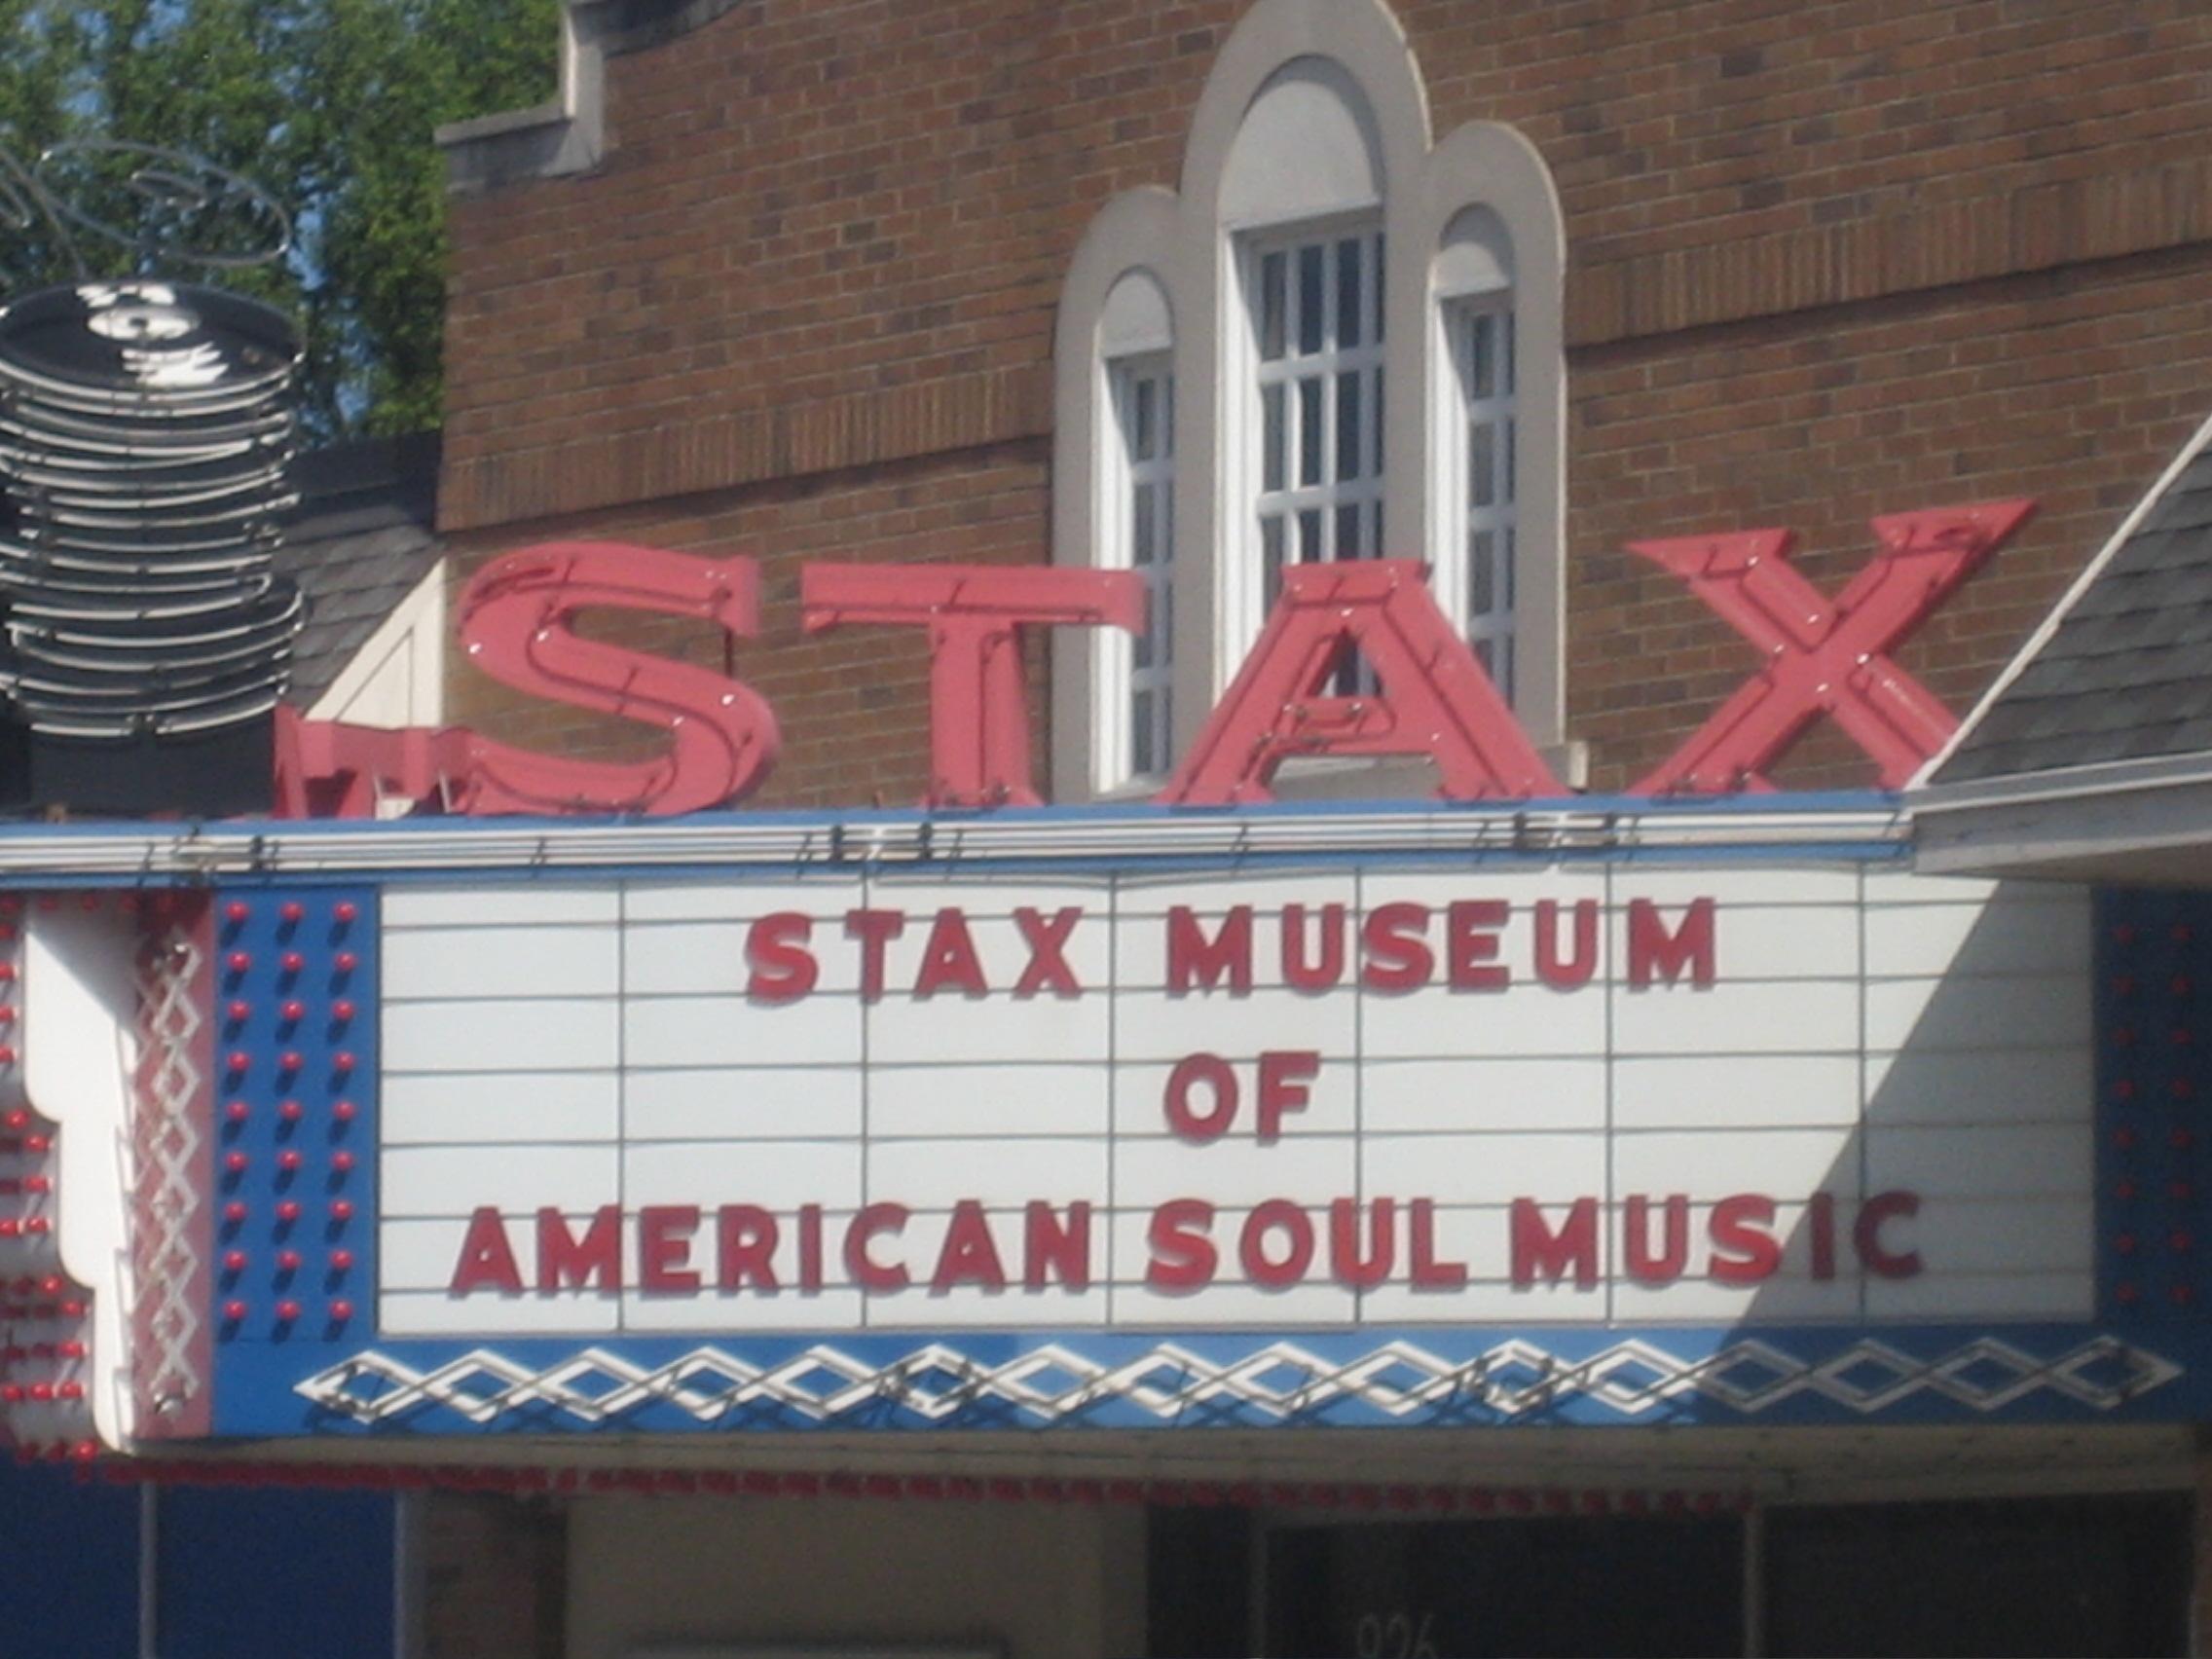 Stax studio